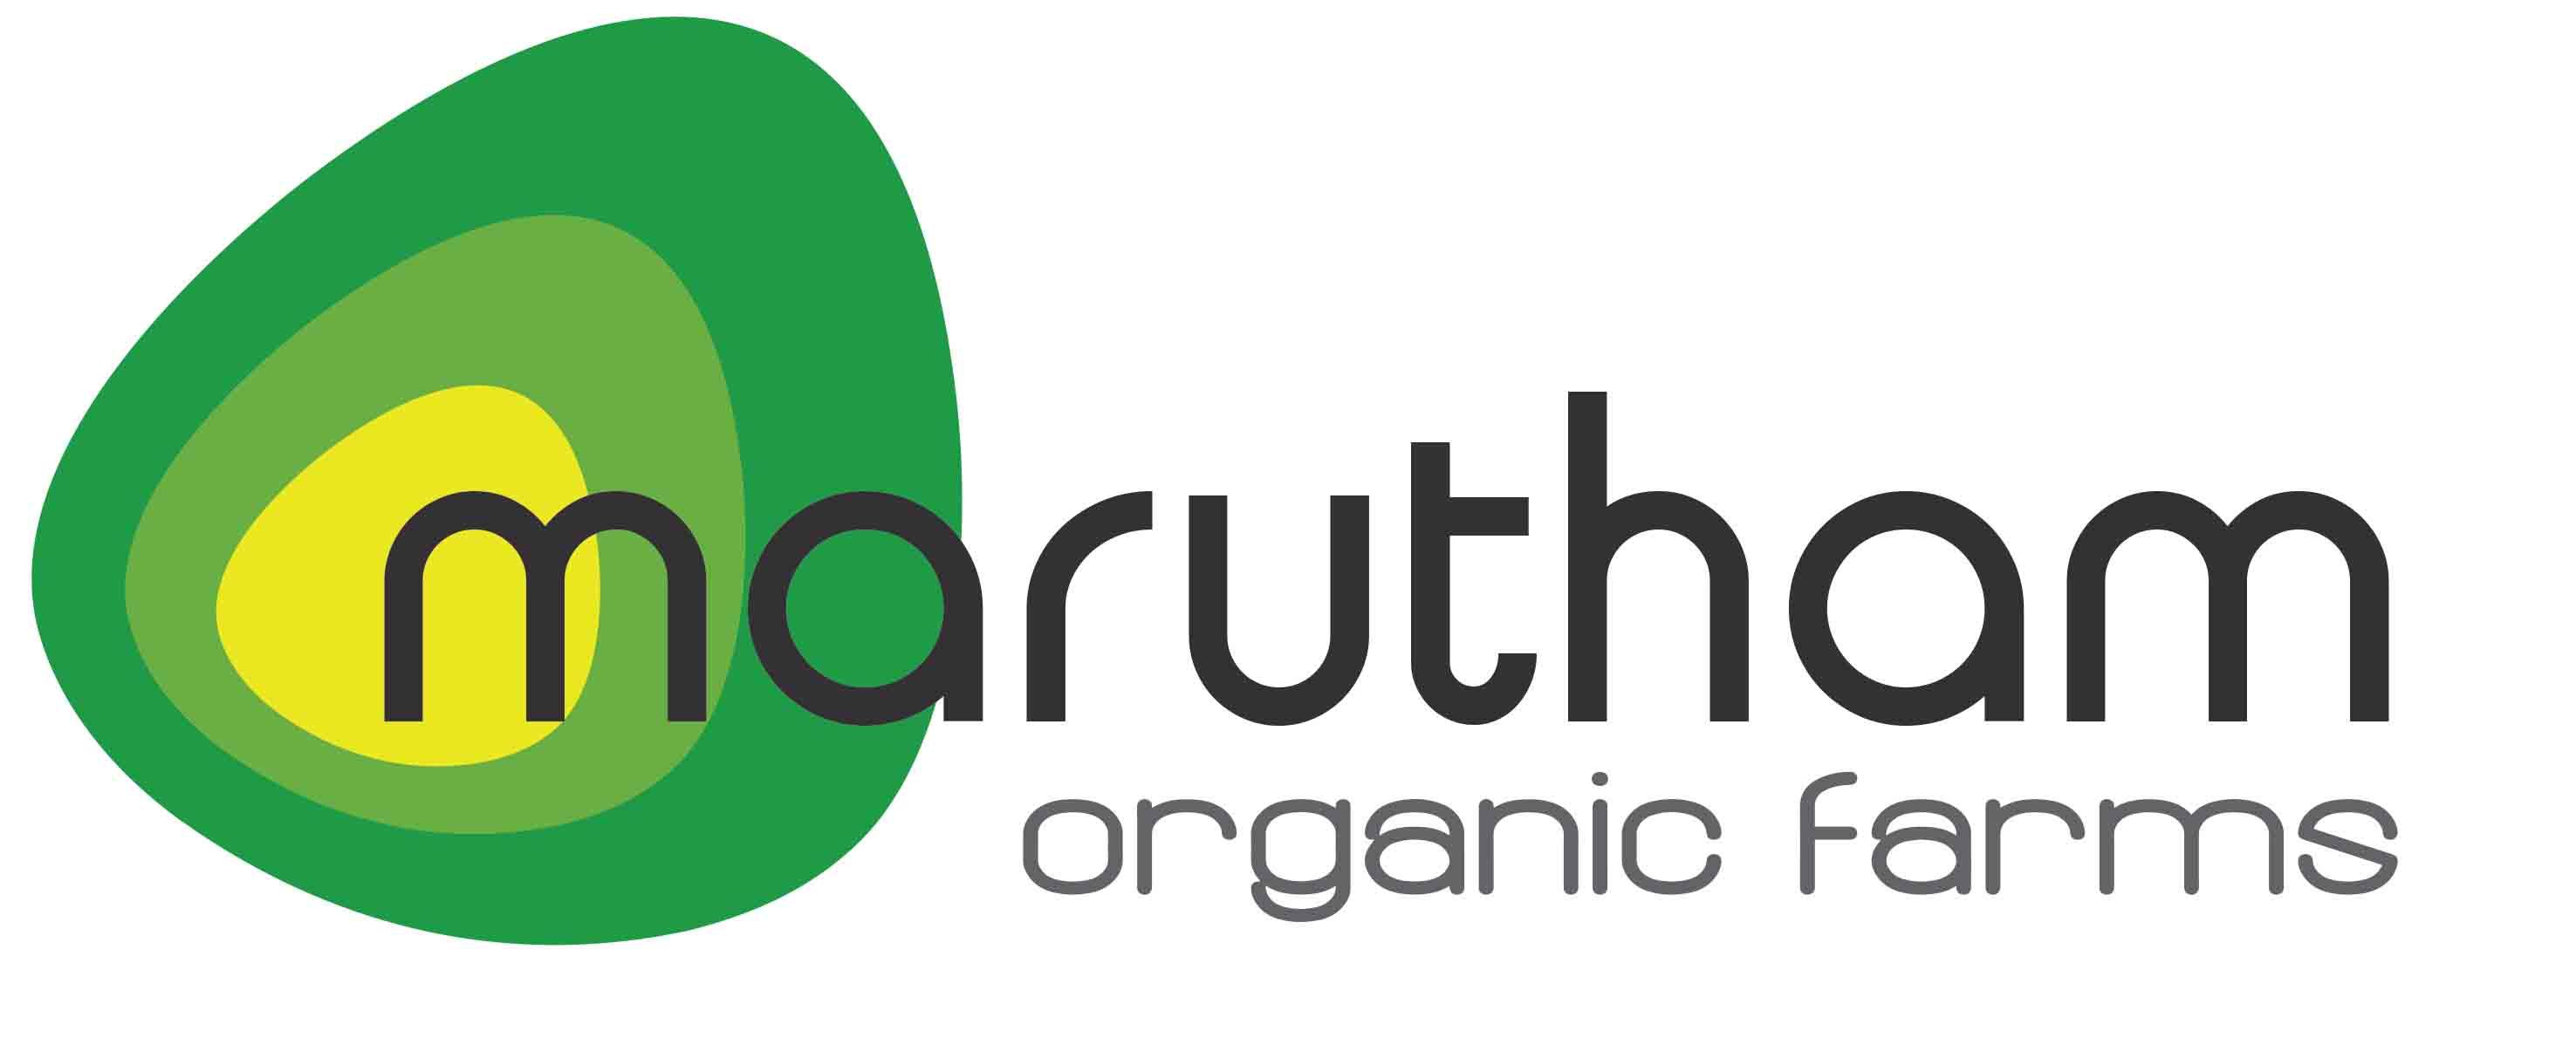 Marutham Organic Farms